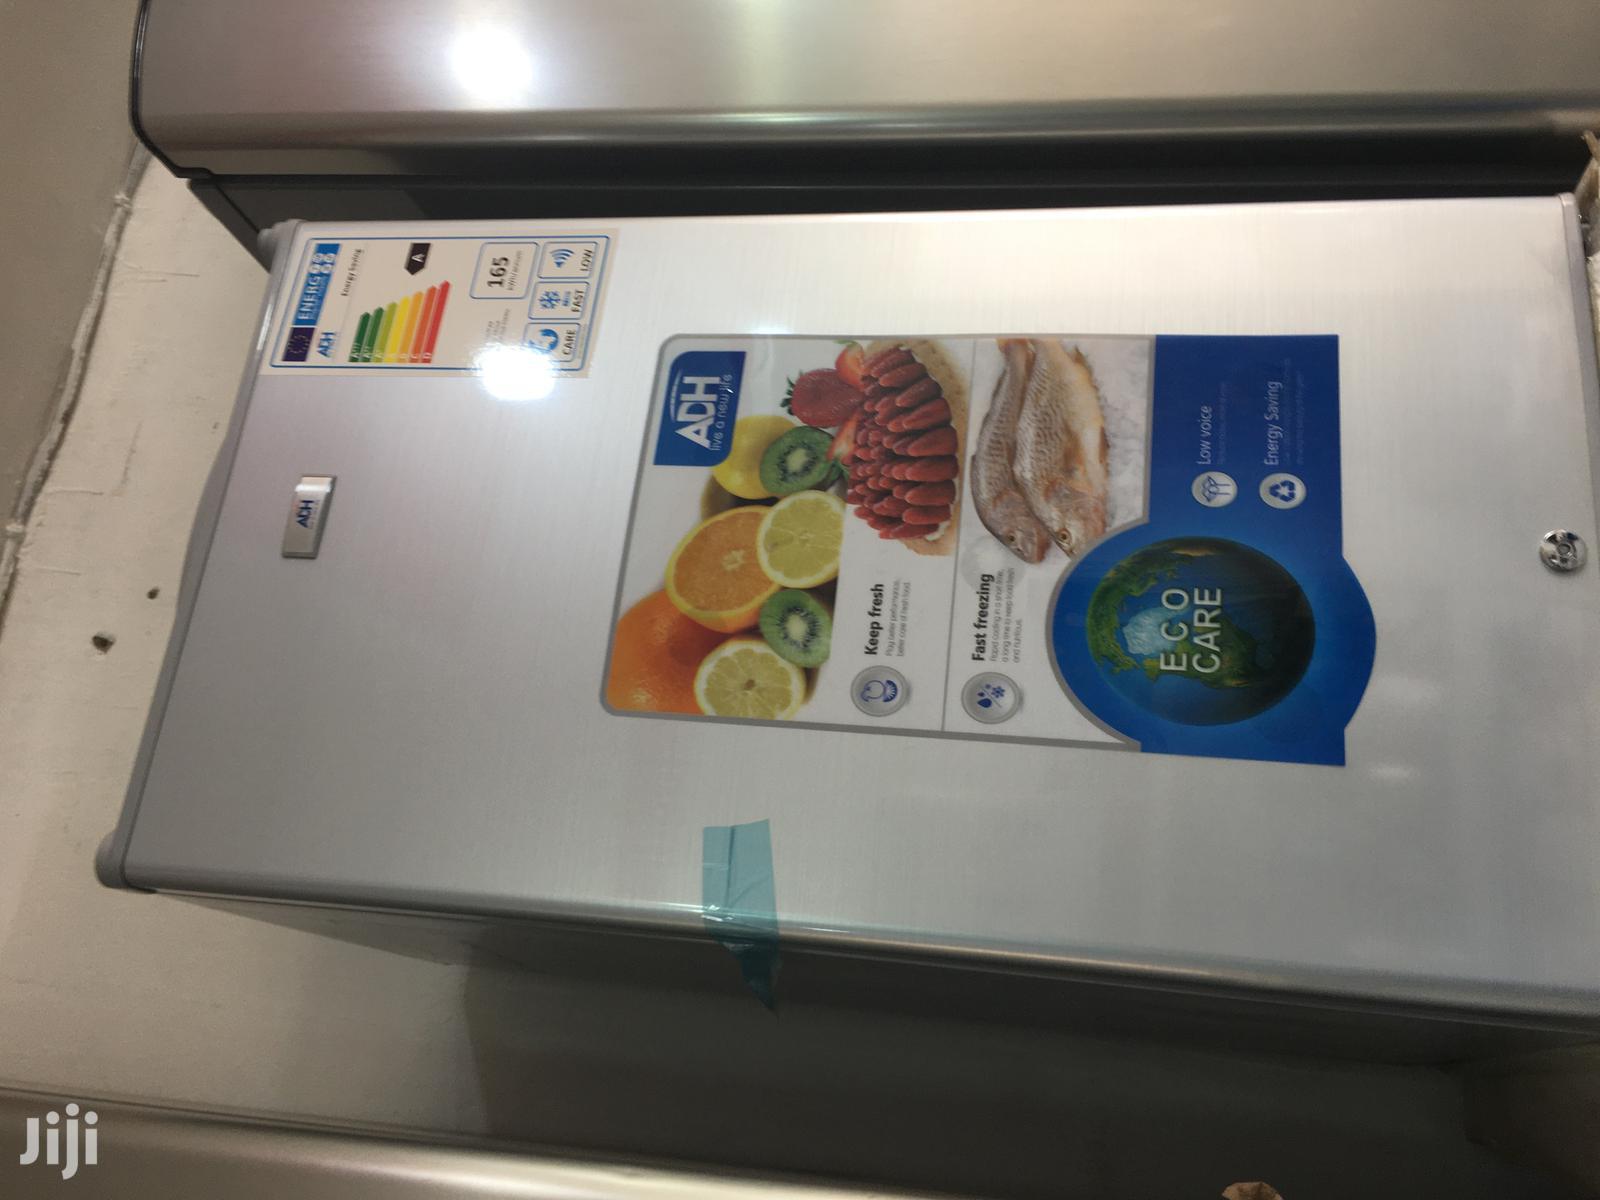 Adh 98L Refrigerator | Kitchen Appliances for sale in Kampala, Central Region, Uganda